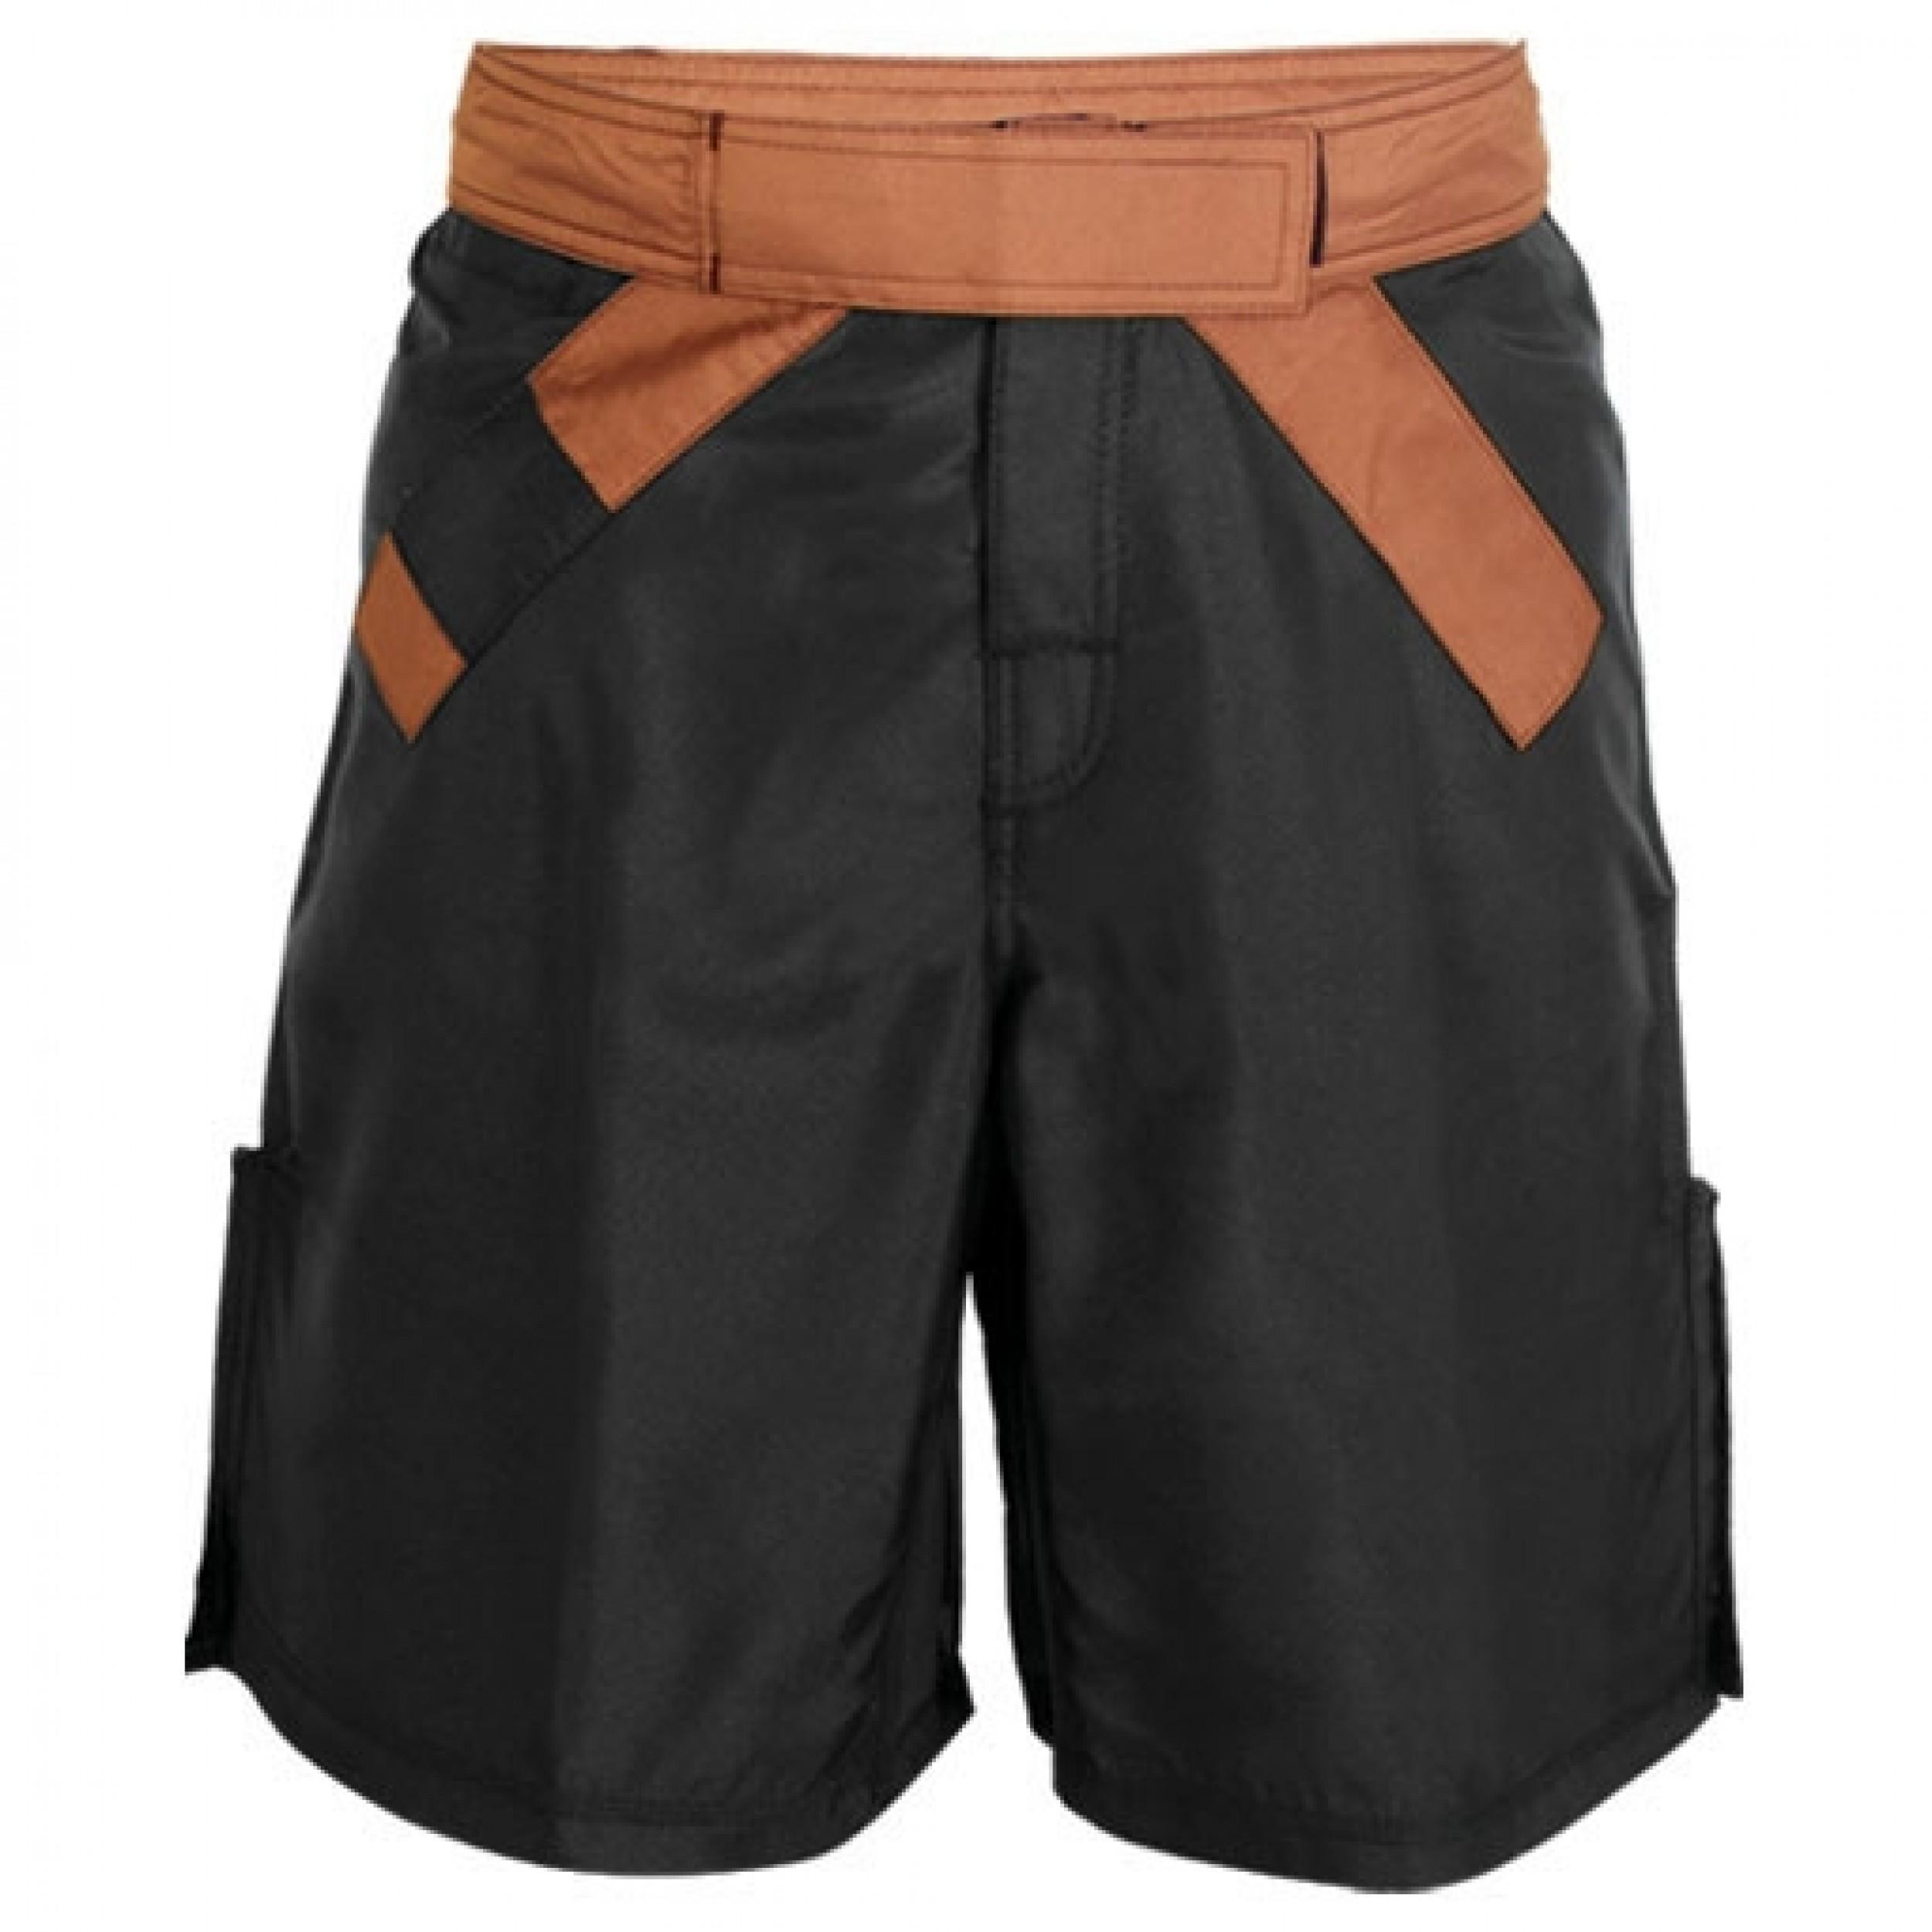 MMA Rank Shorts Black/Brown belt